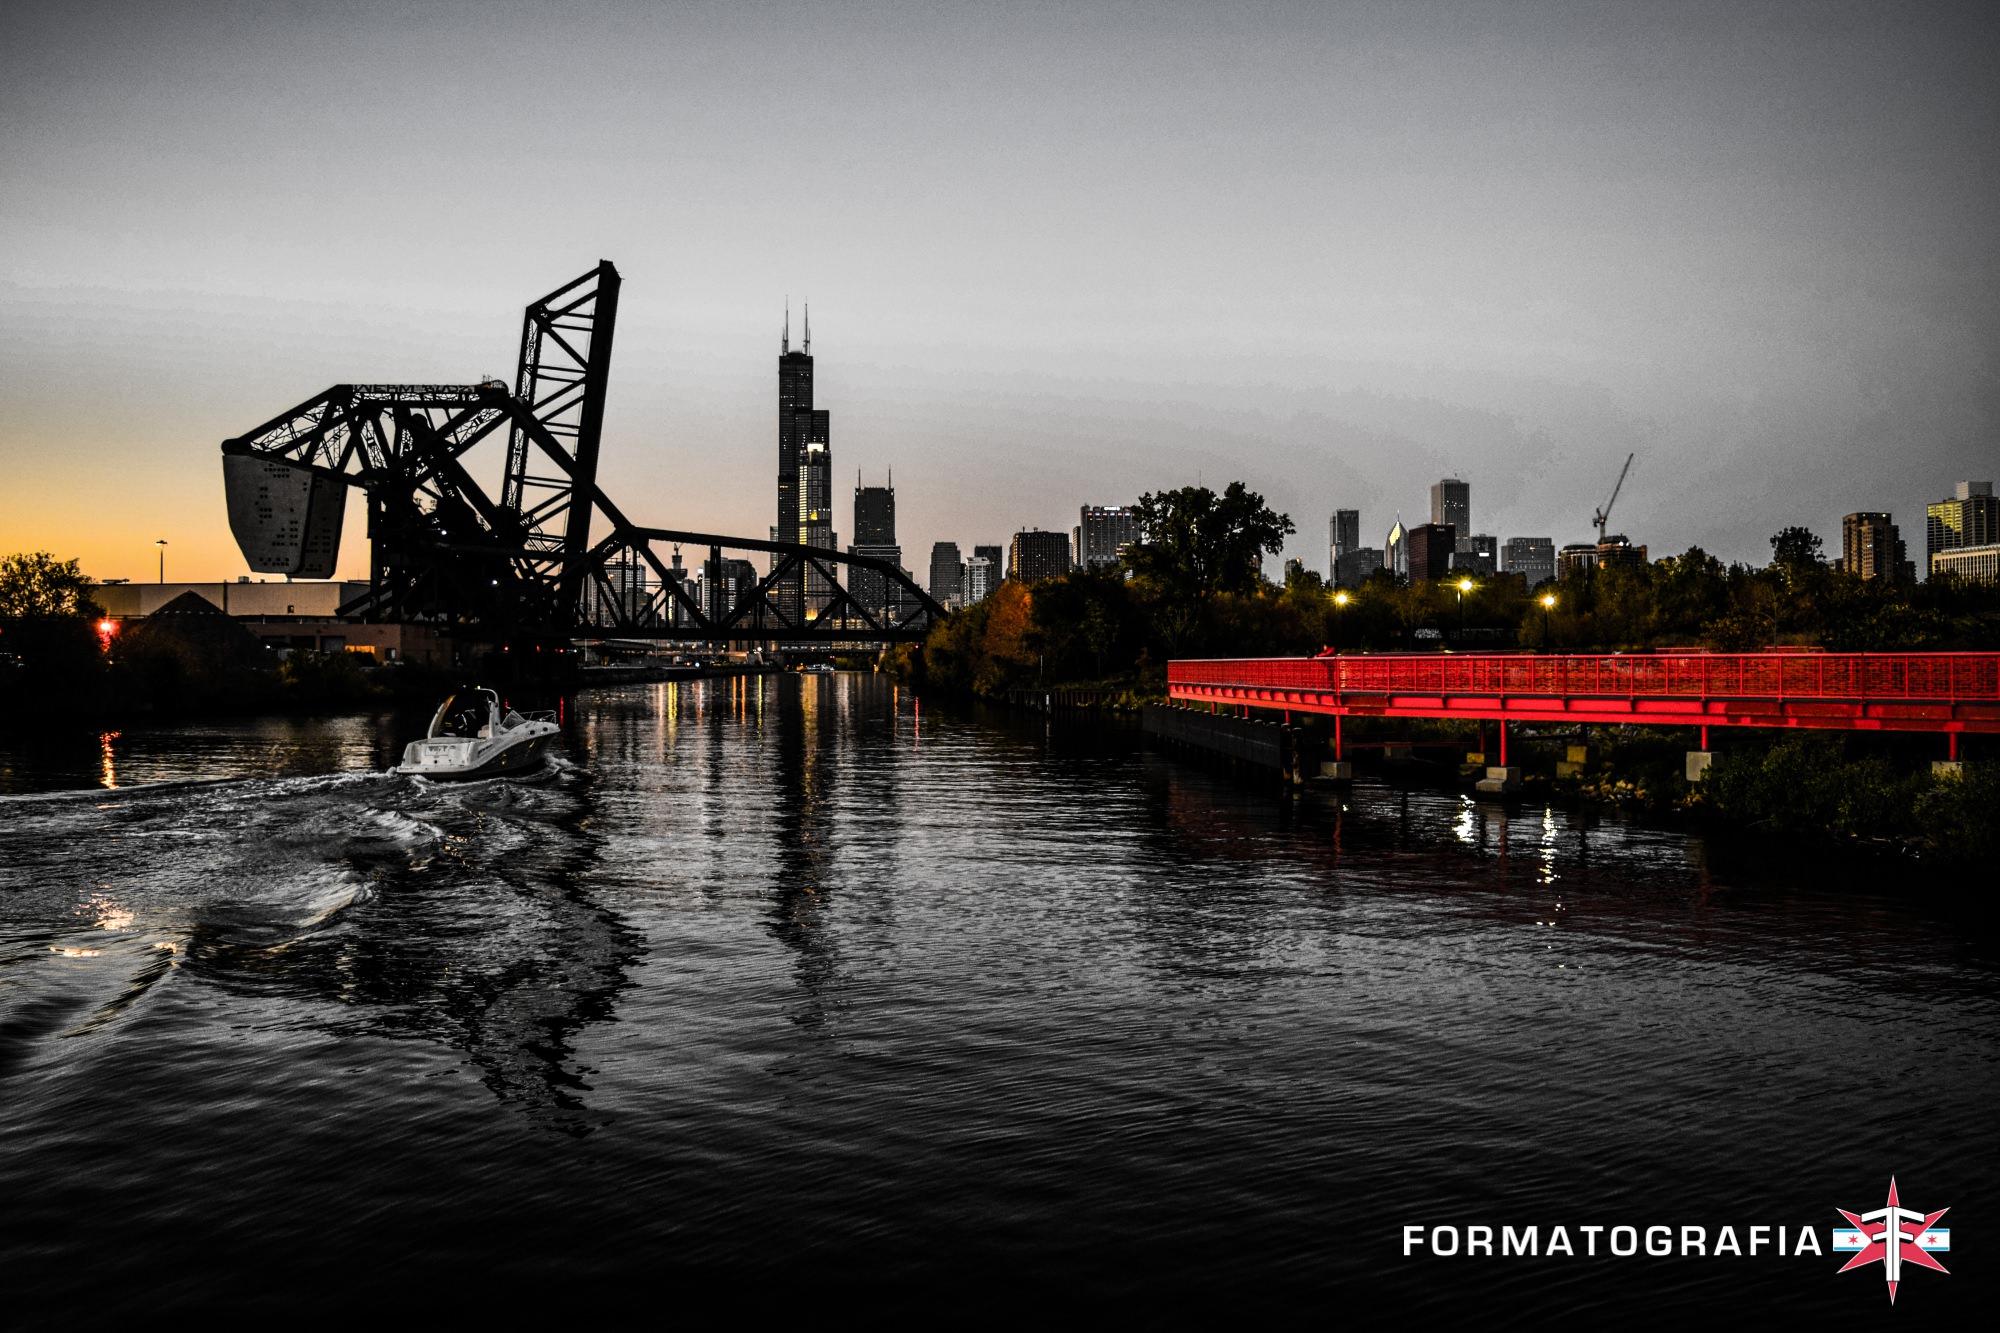 eric formato chicago photographer fall update city architecture shotsDSC_0393-55.jpg